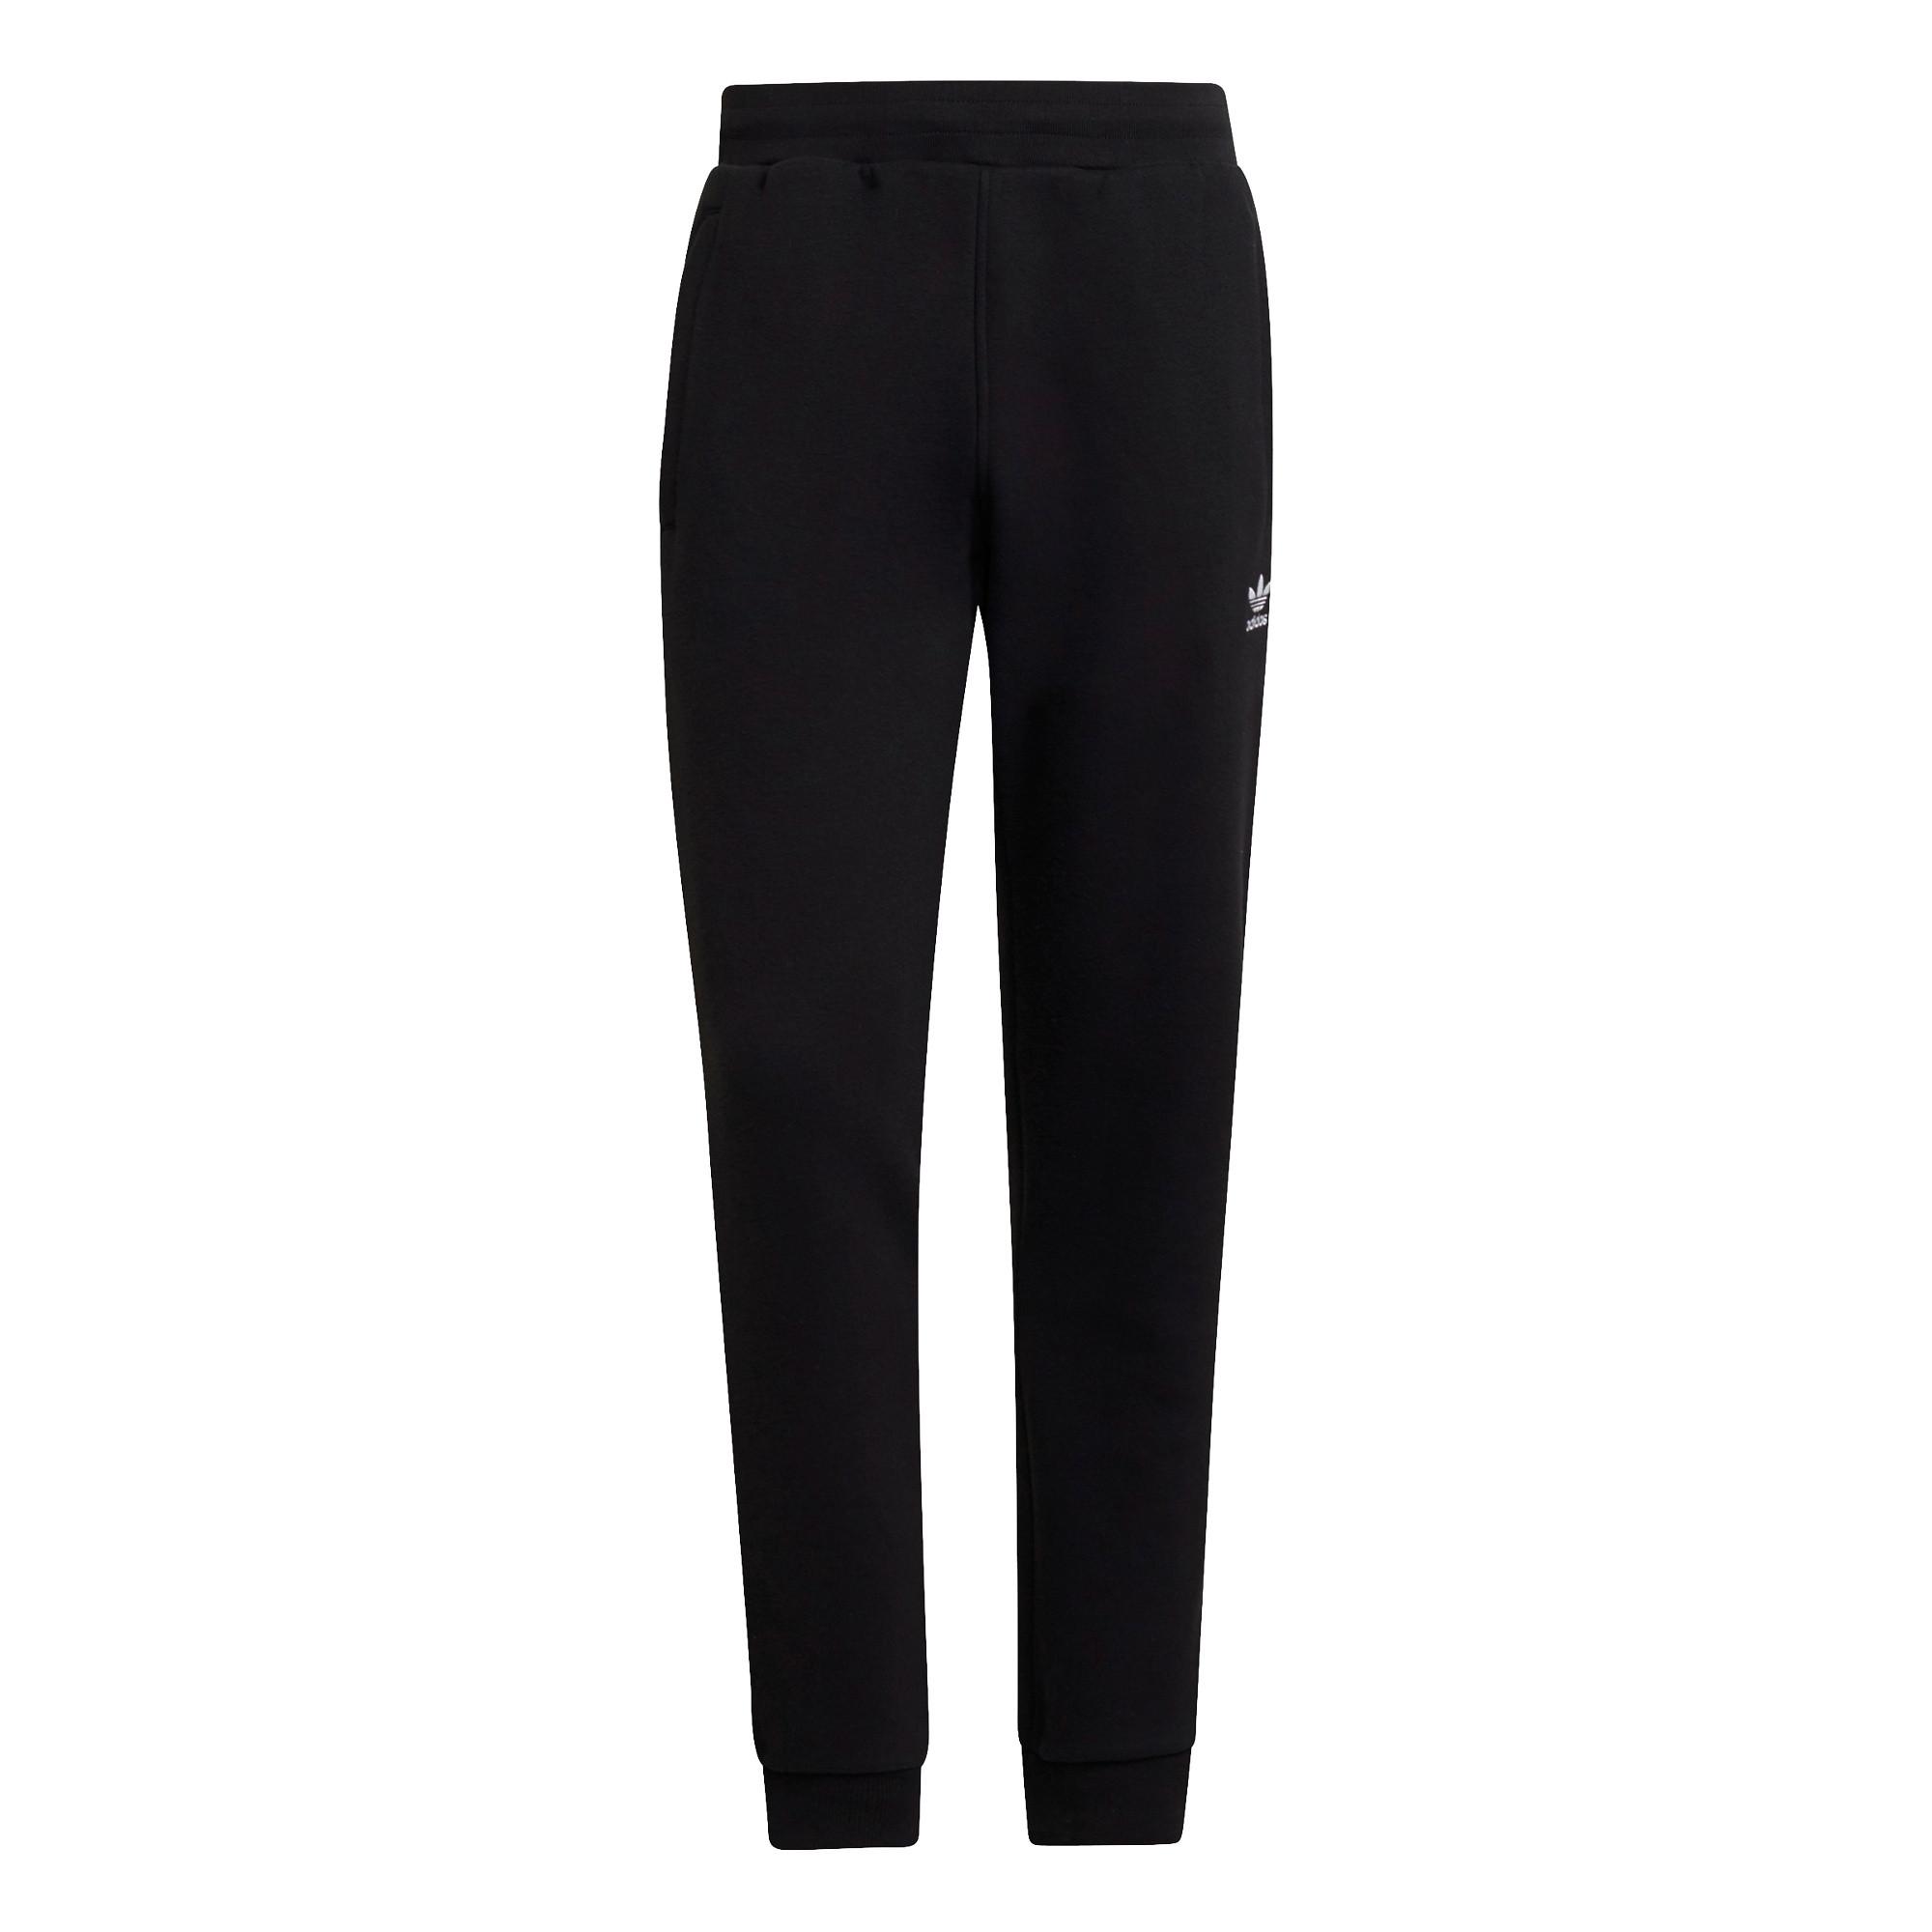 Pantaloni adicolor Essentials Trefoil, Nero, large image number 0